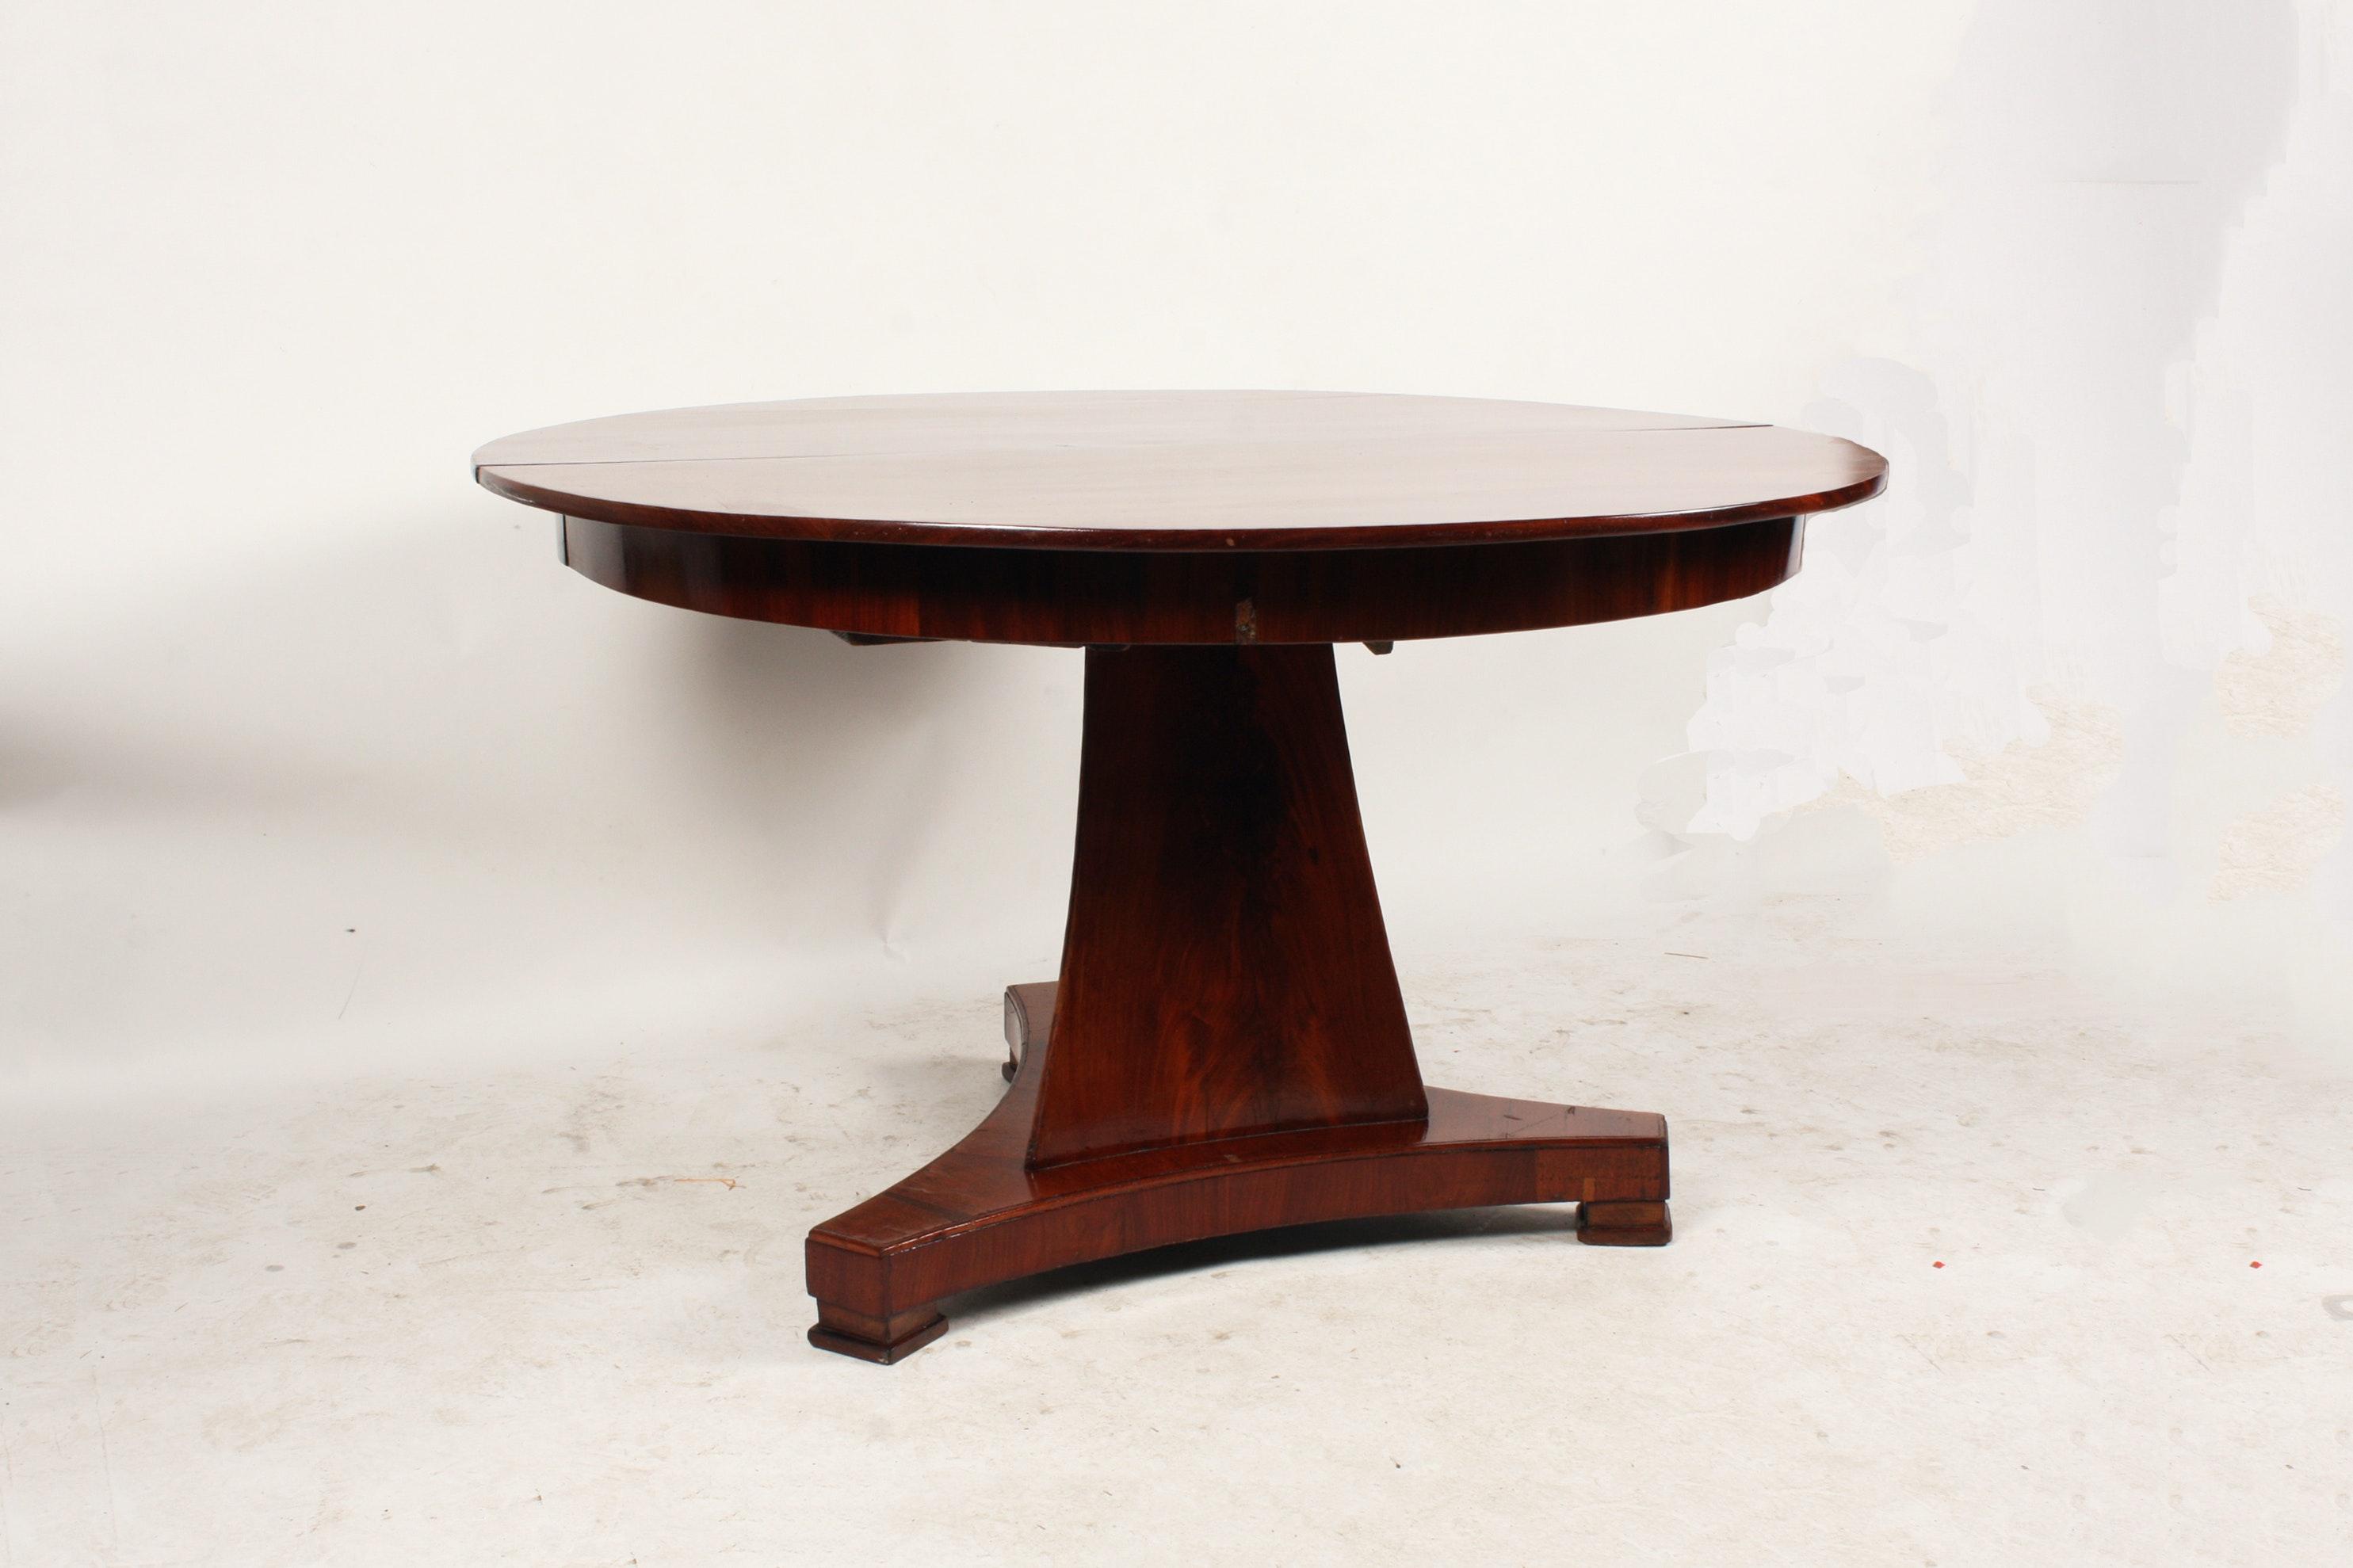 Antique Biedermeier Style Walnut Round Dining Table ...